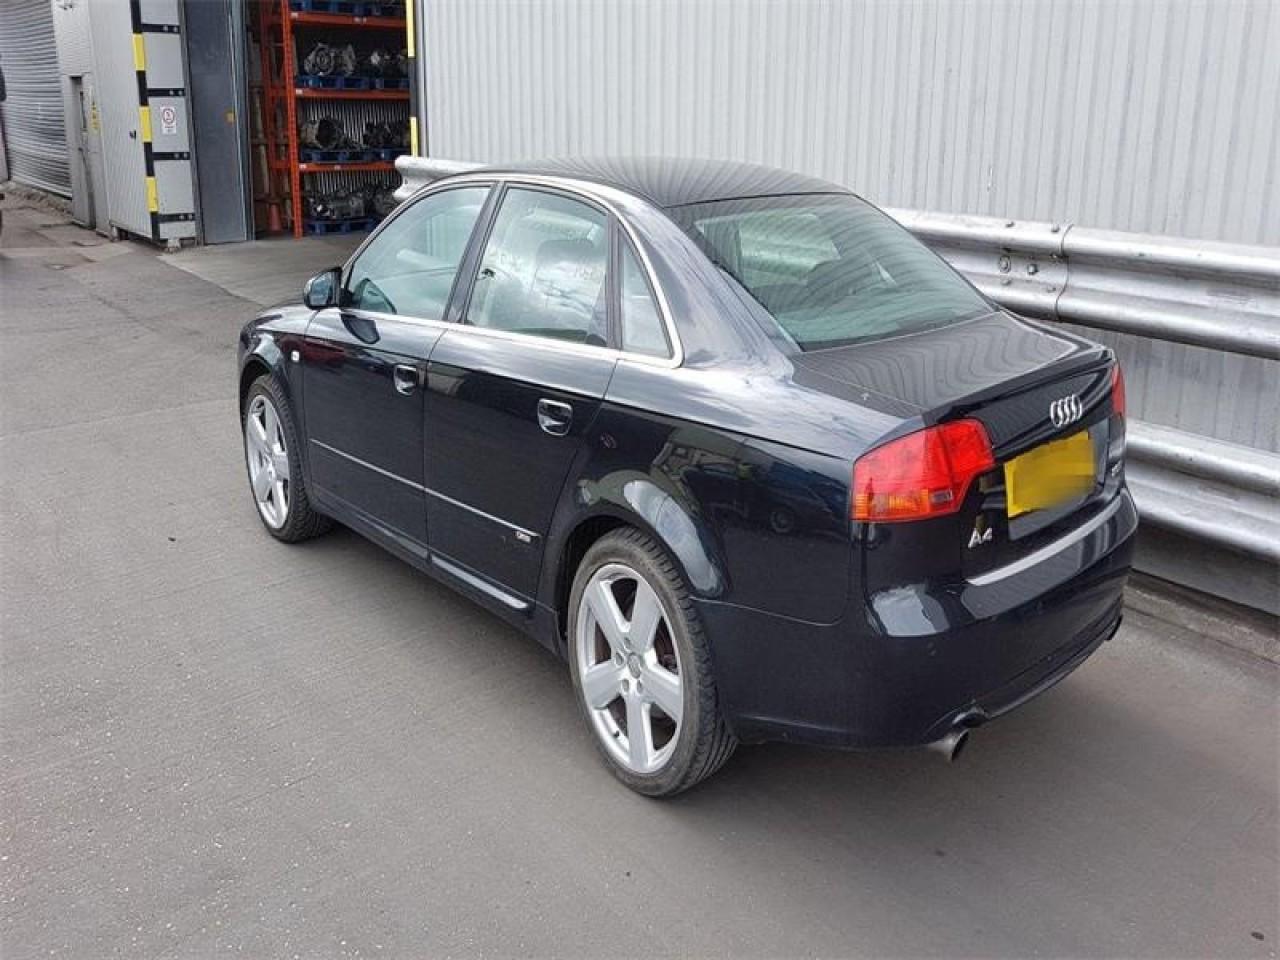 Oglinda stanga completa Audi A4 B7 2005 Sedan 2.0 TFSi